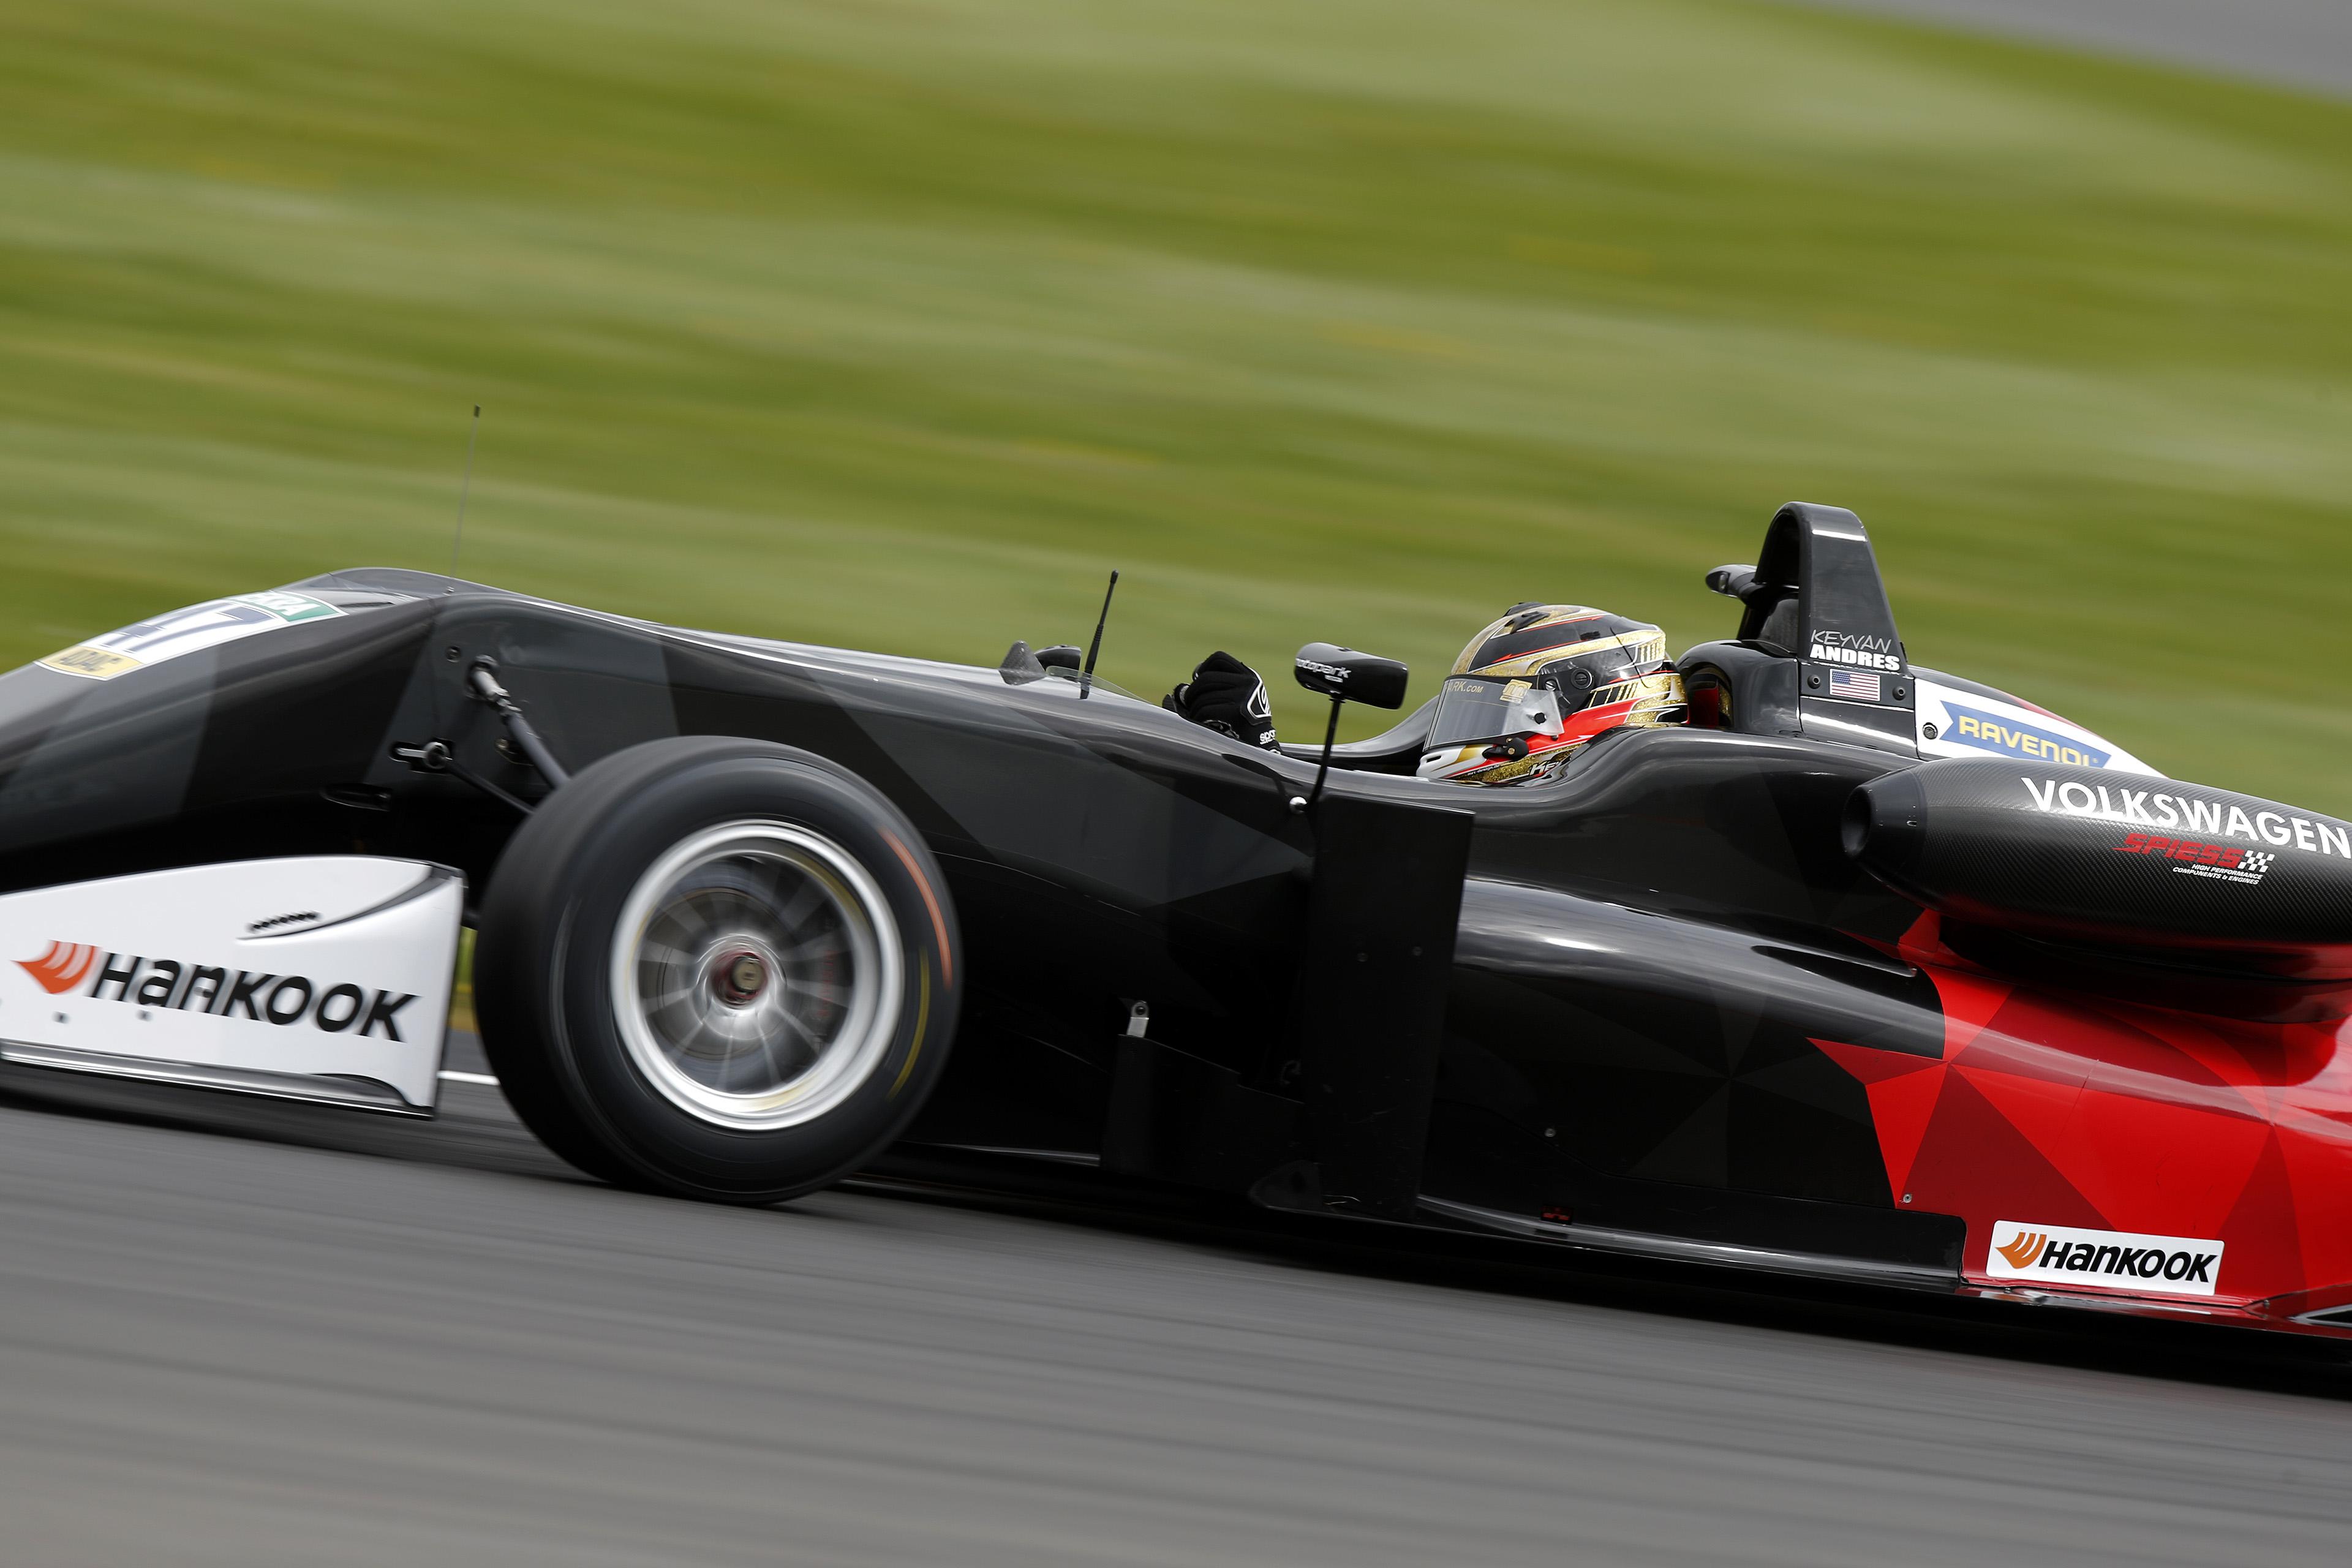 2017-FIA-F3-01-Suer-0610